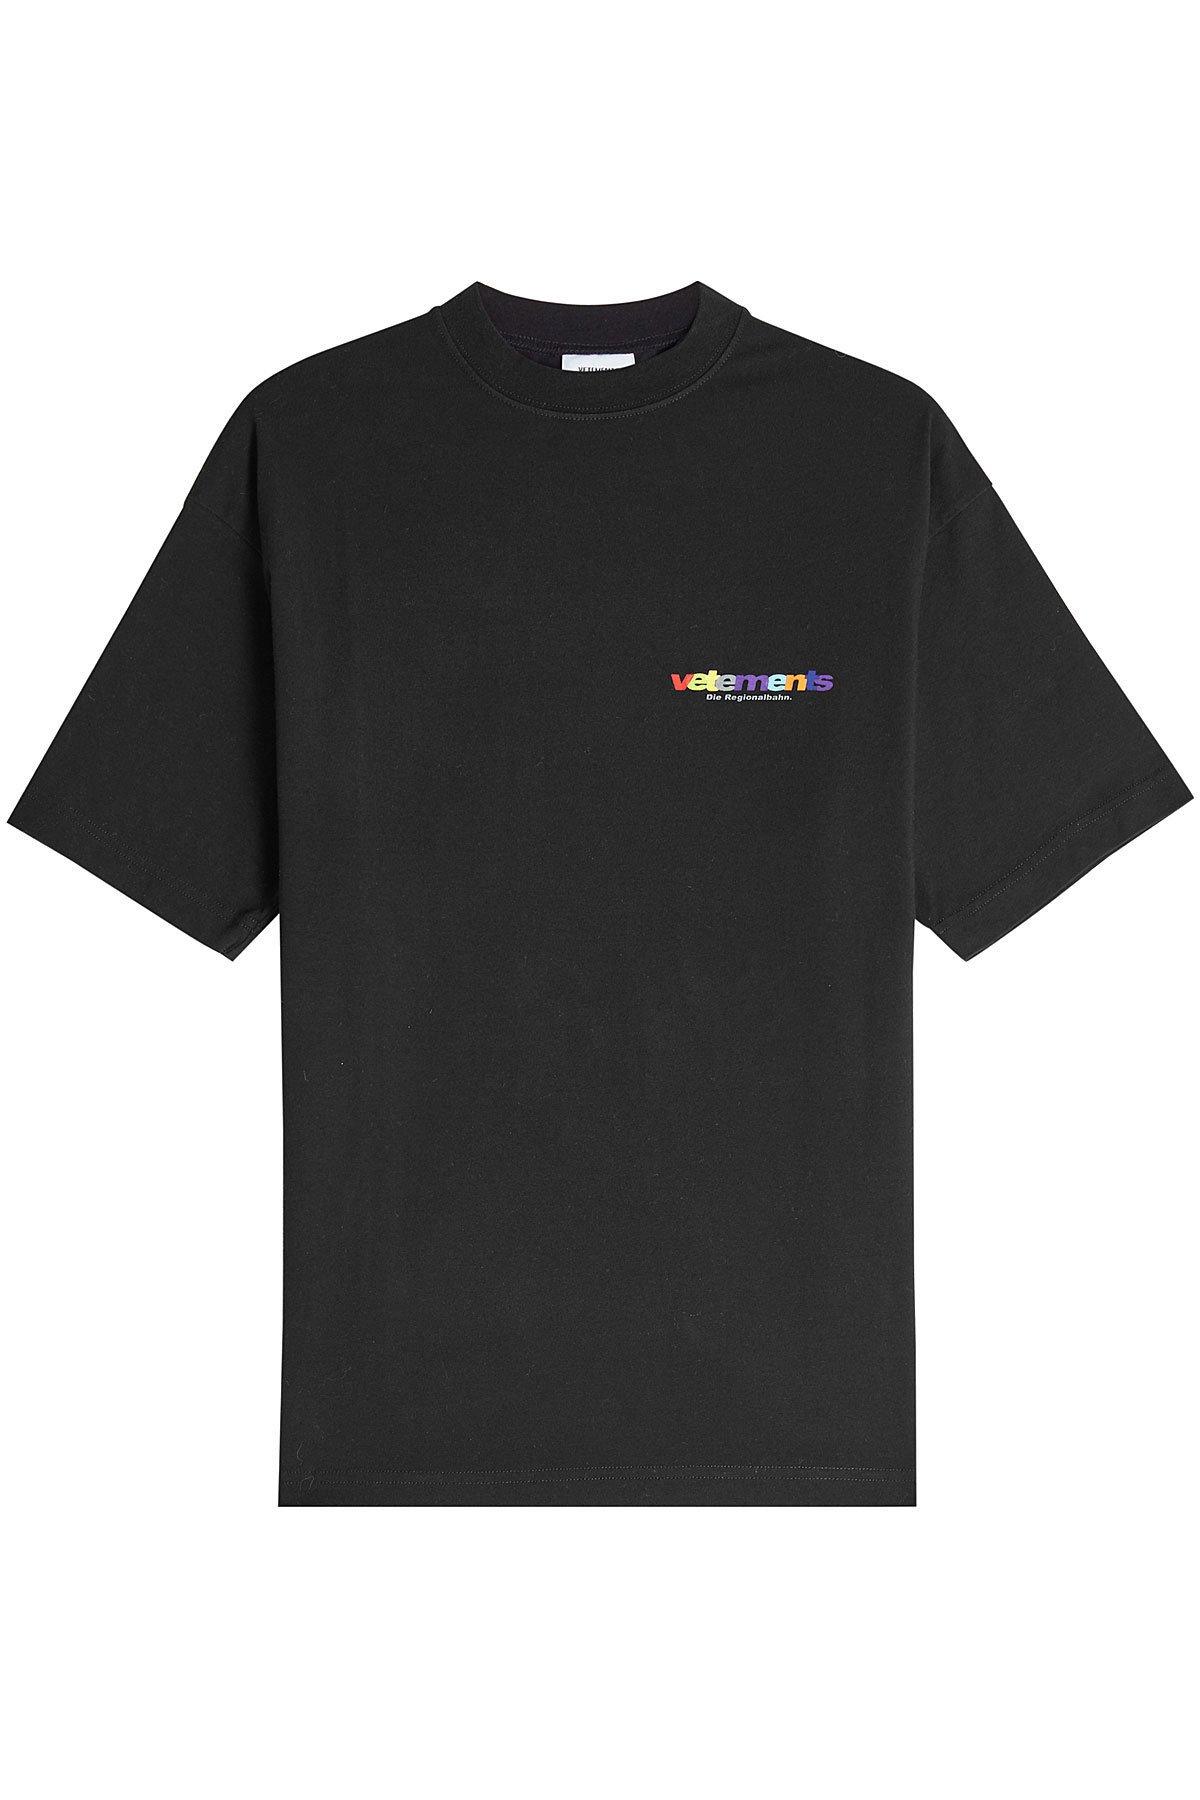 Printed Cotton T-Shirt Gr. M